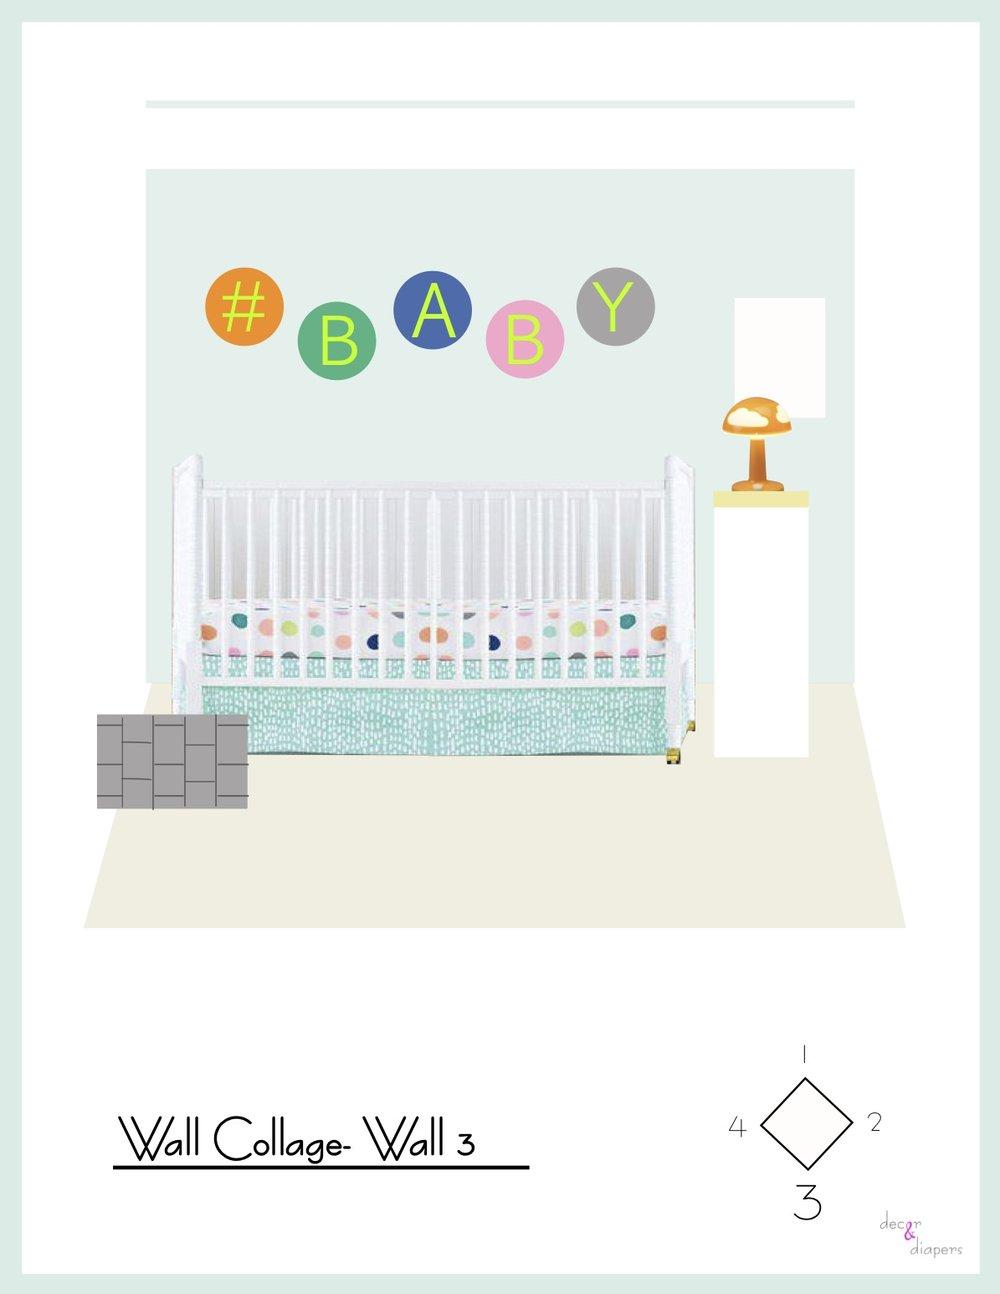 20161101 Henkin- nursery- wall collage- wall 3- #baby.jpg